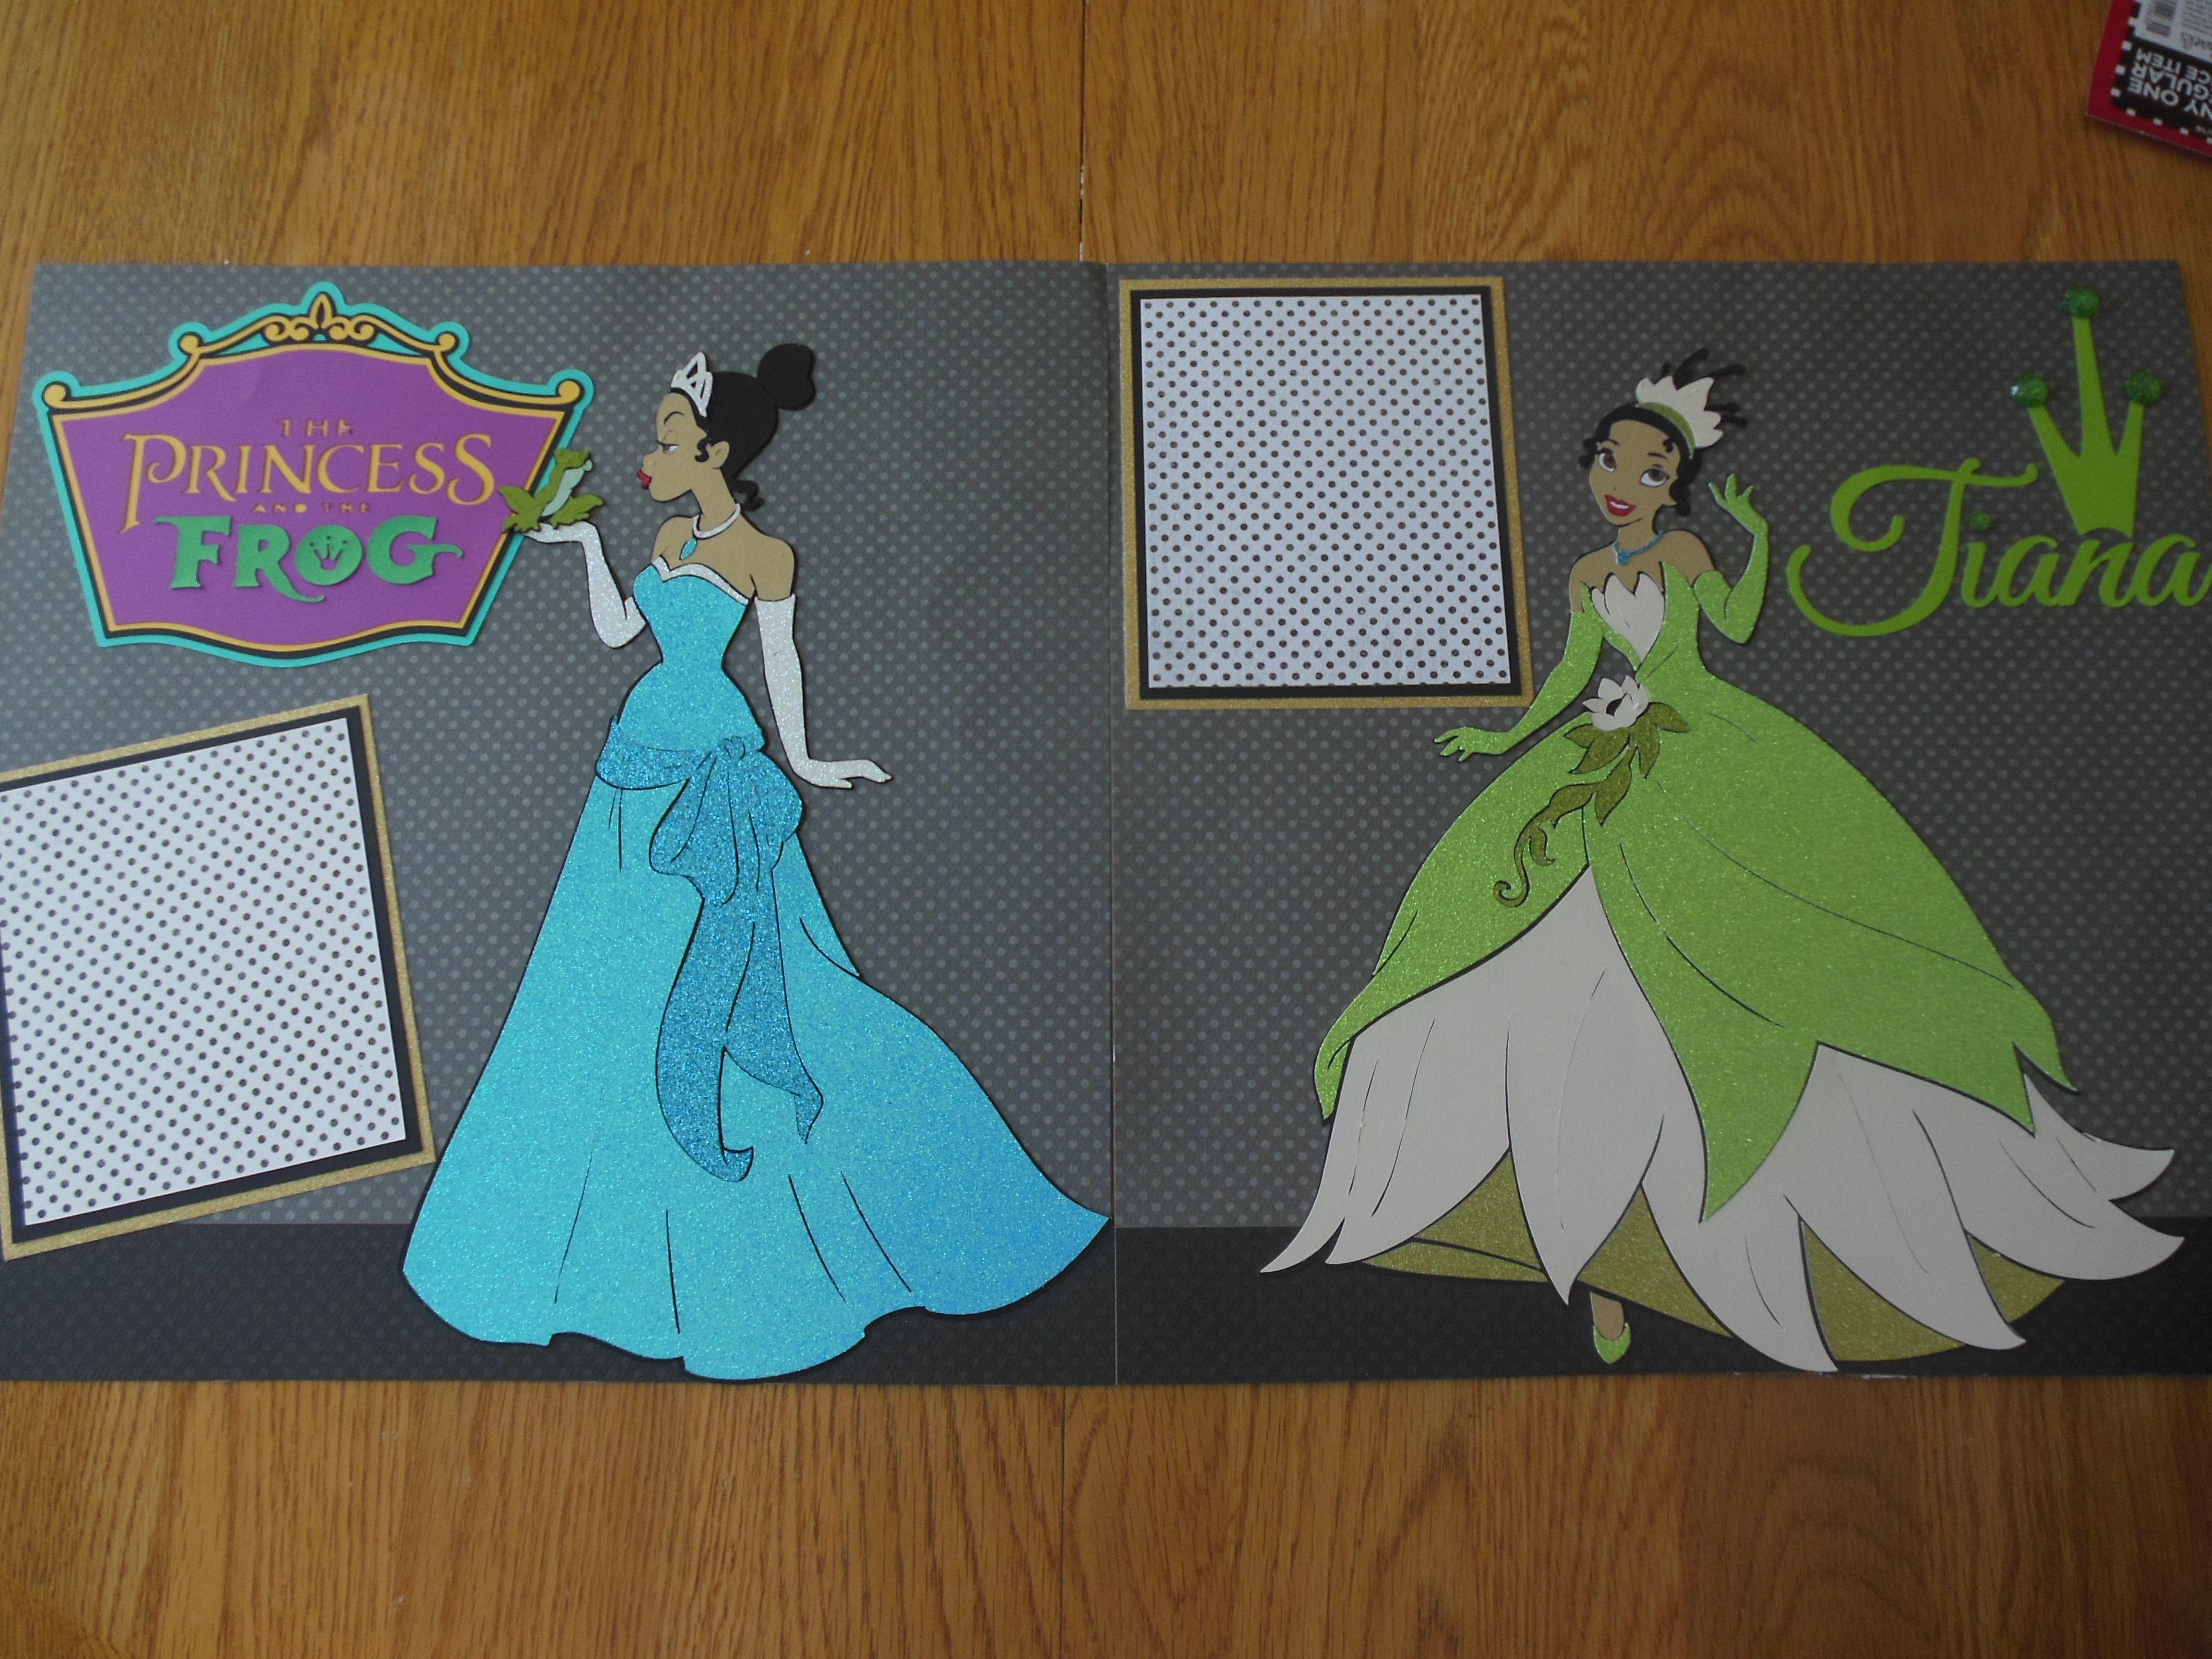 Scrapbook ideas using cricut - Princess And The Frog Layout Using Cricut Princess Believing In Dreams Cartridge Disney Princess Scrapbook Layouts